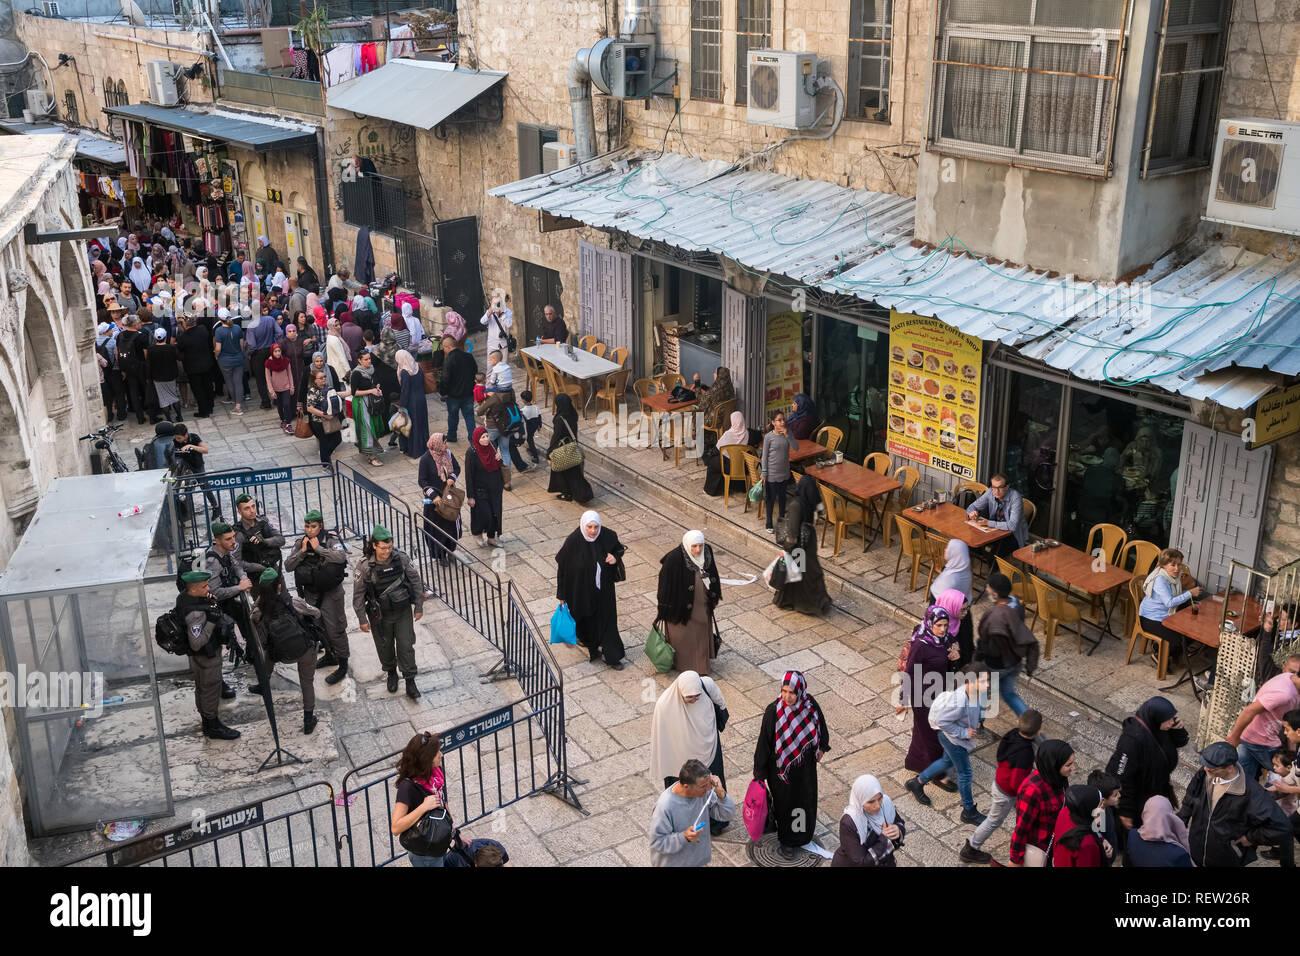 Jerusalem, Israel - November 20, 2018: Military checkpoint on touristy via Dolorosa street in Jerusalem, Israel. - Stock Image